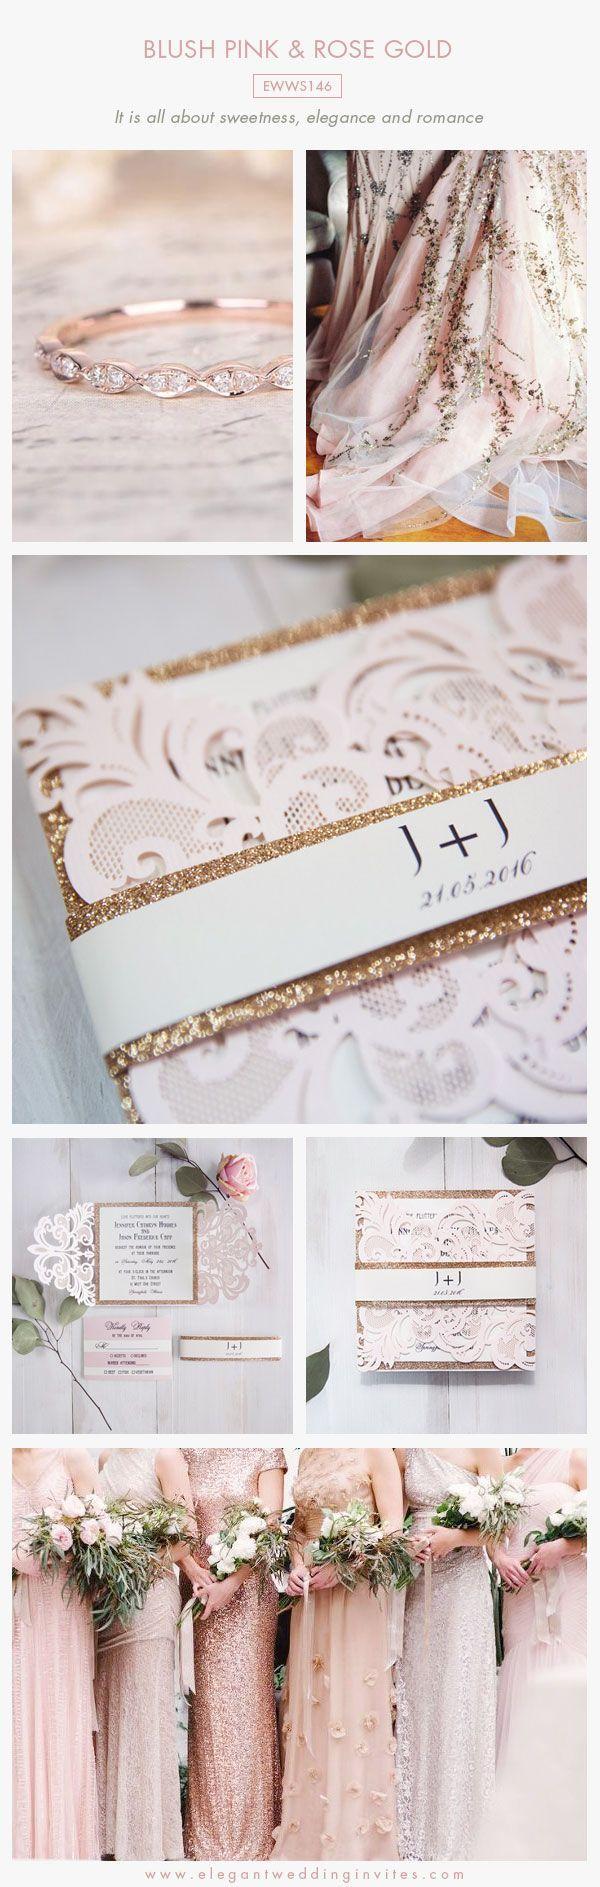 25 best wedding invitations images on Pinterest | Invites, Bridal ...